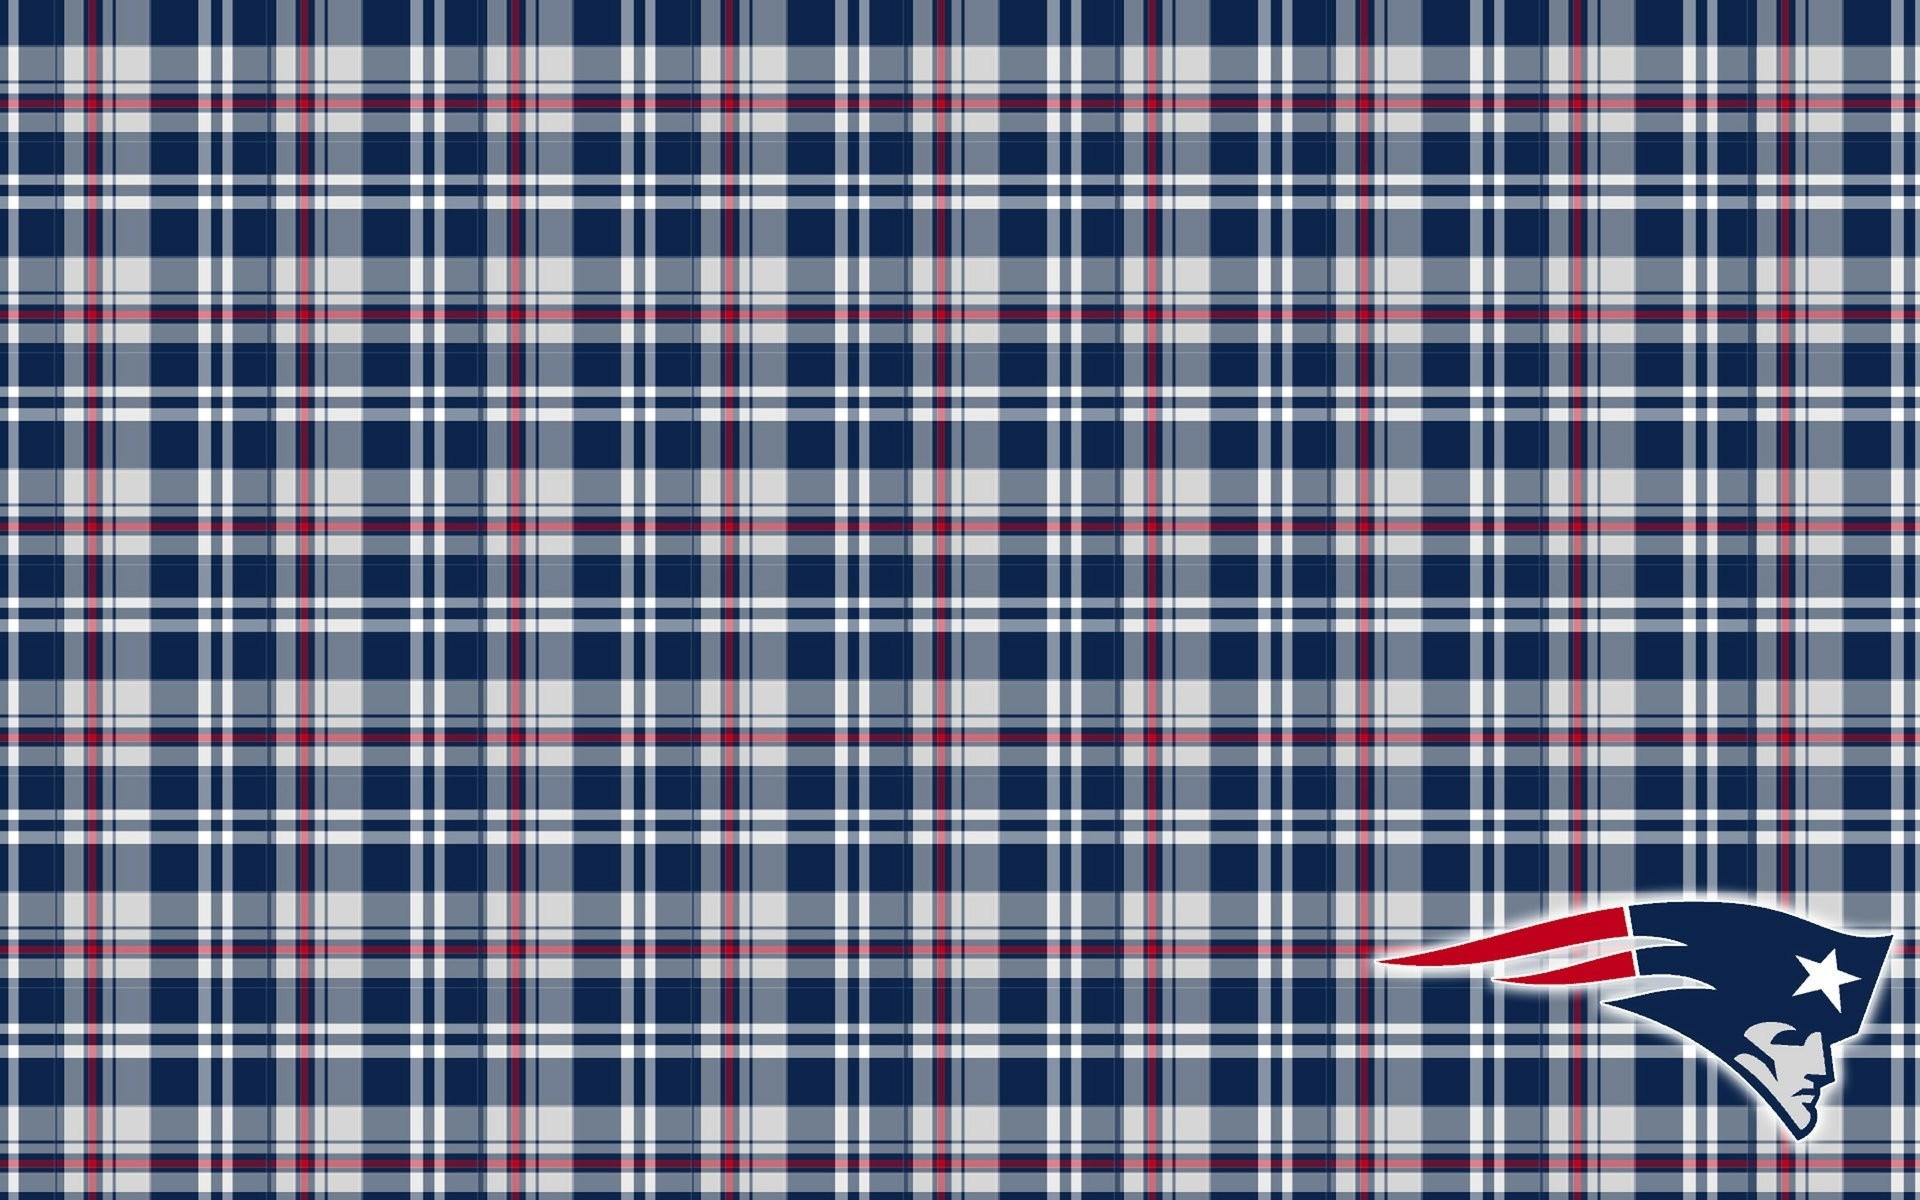 Explore New England Patriots Wallpaper and more!